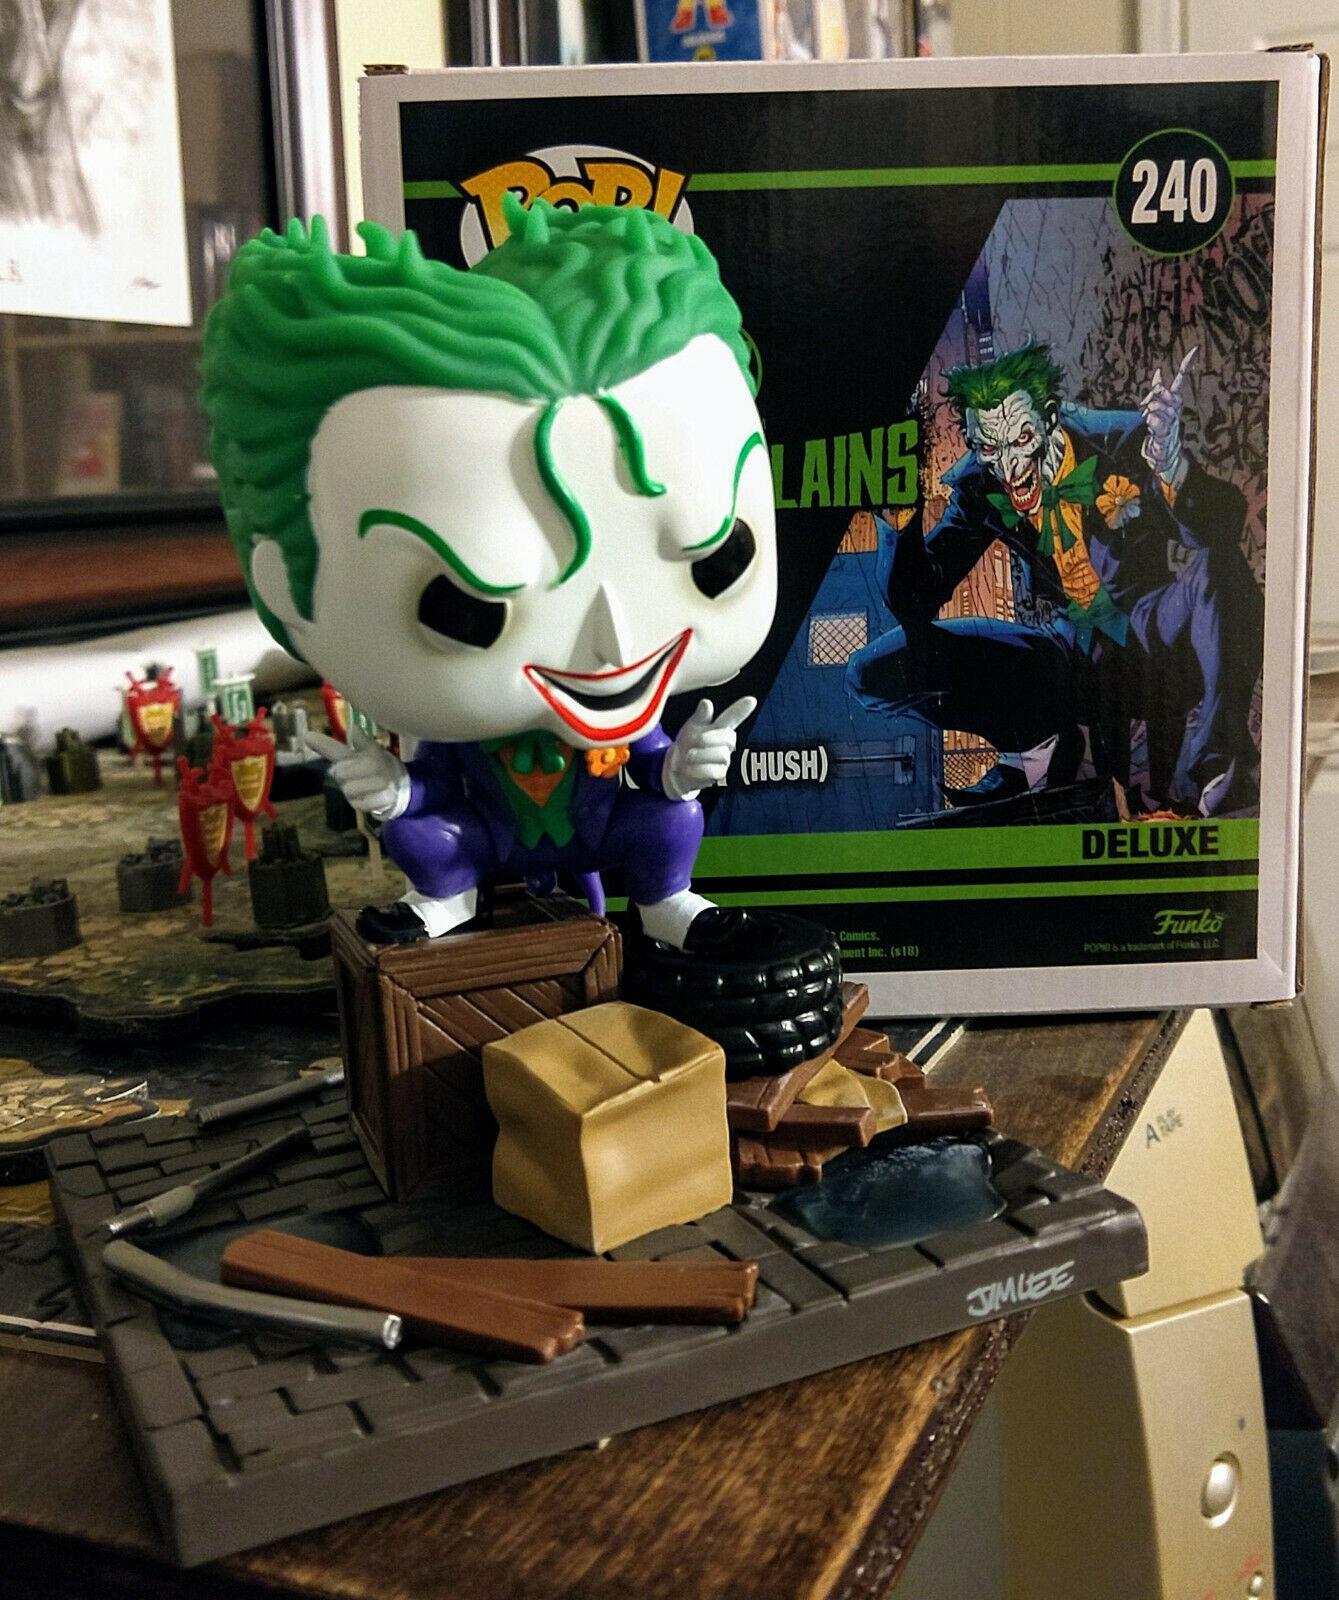 Diverdeimentoko pop The Joker hush 240 Dc collection jim lee  deluxe super villains cifra  liquidazione fino al 70%